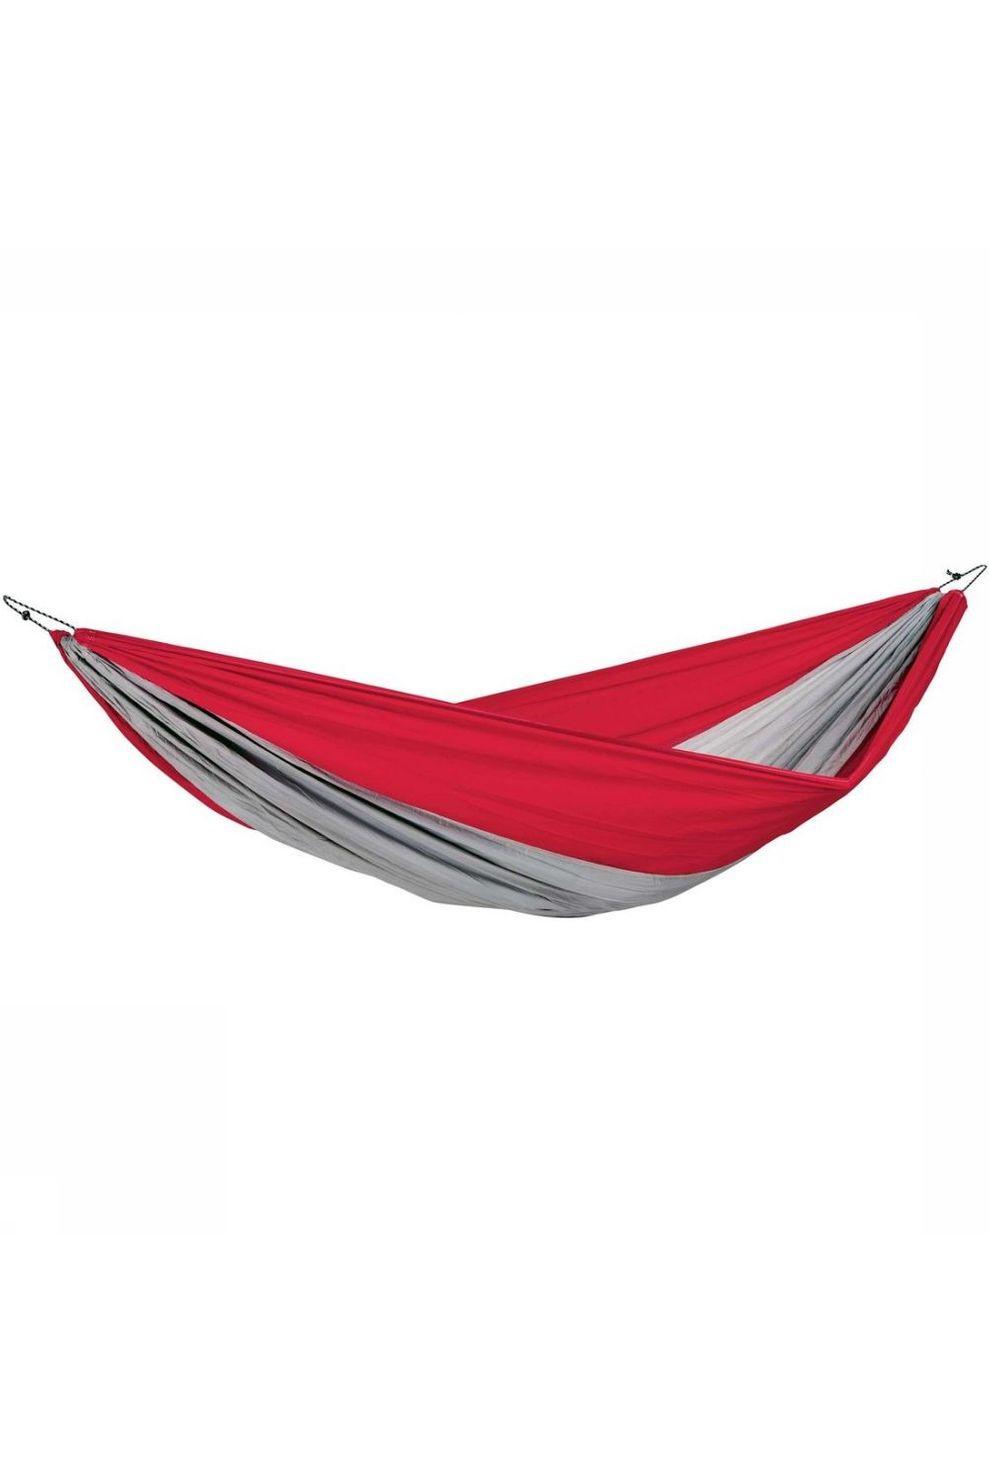 Amazonas Hangmat Silk Traveller Xxl - Grijs/Rood